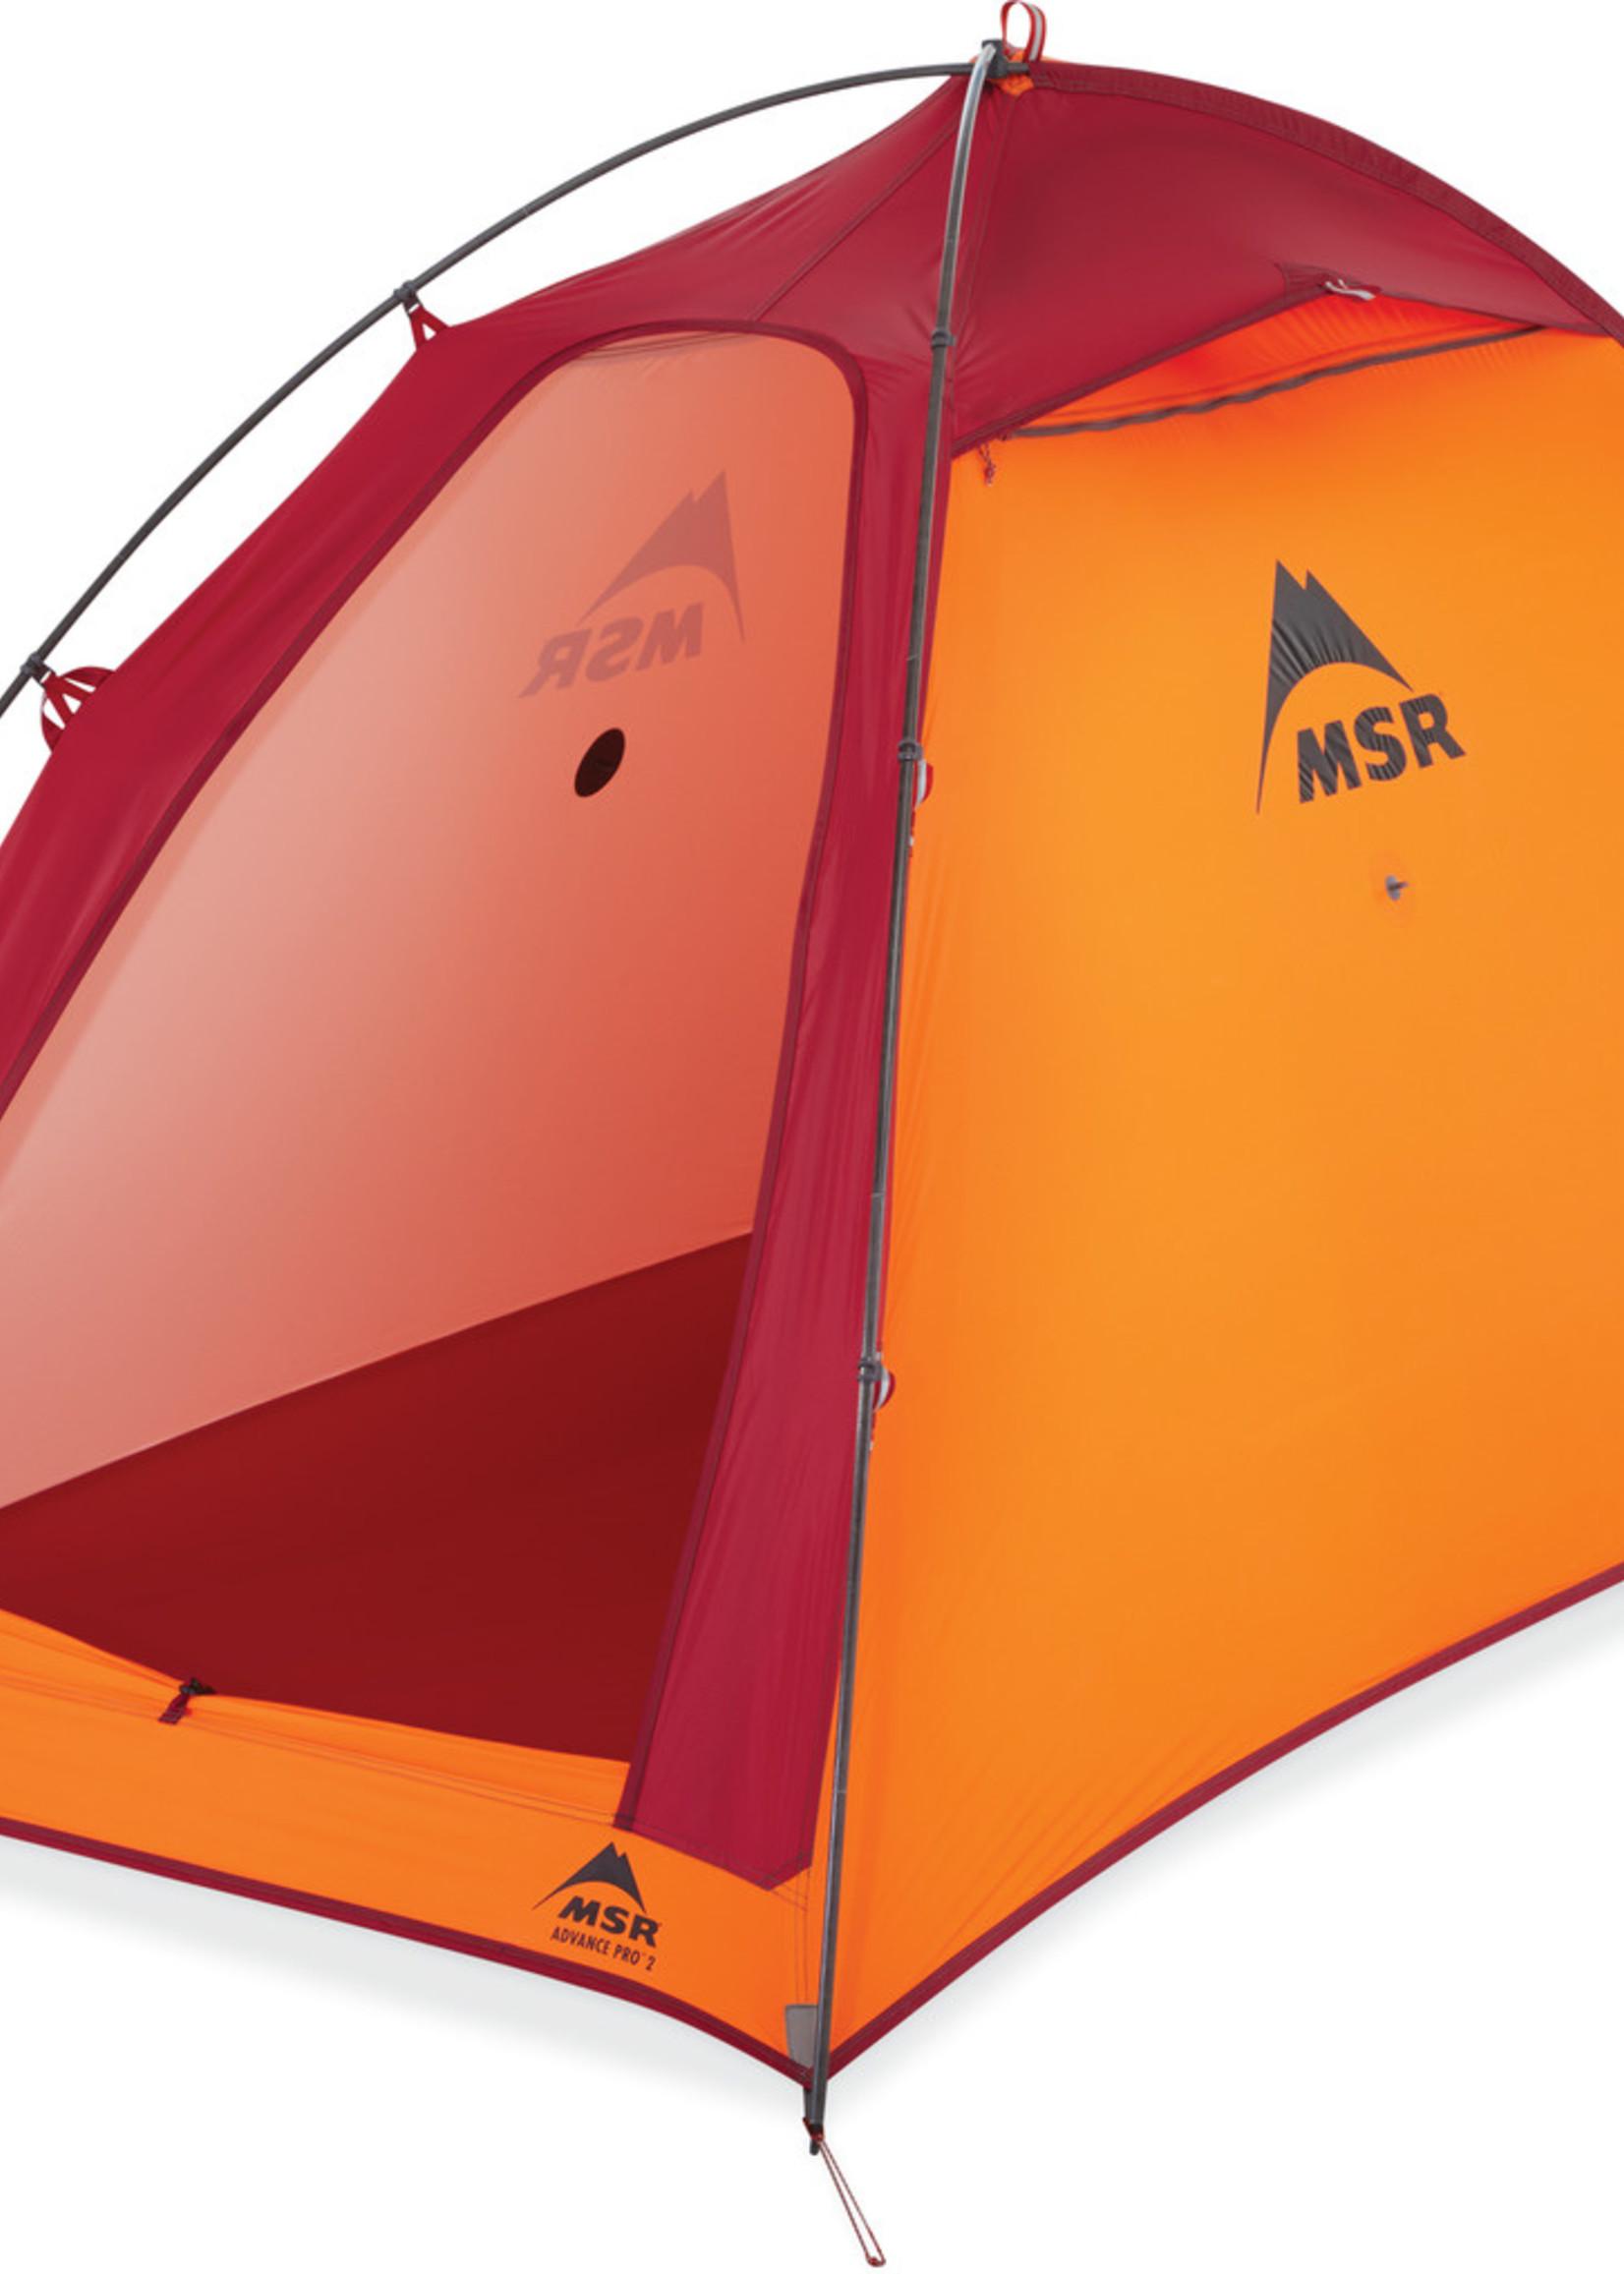 MSR Advance Pro 2 Ultralight 2-Person, 4 Season Tent